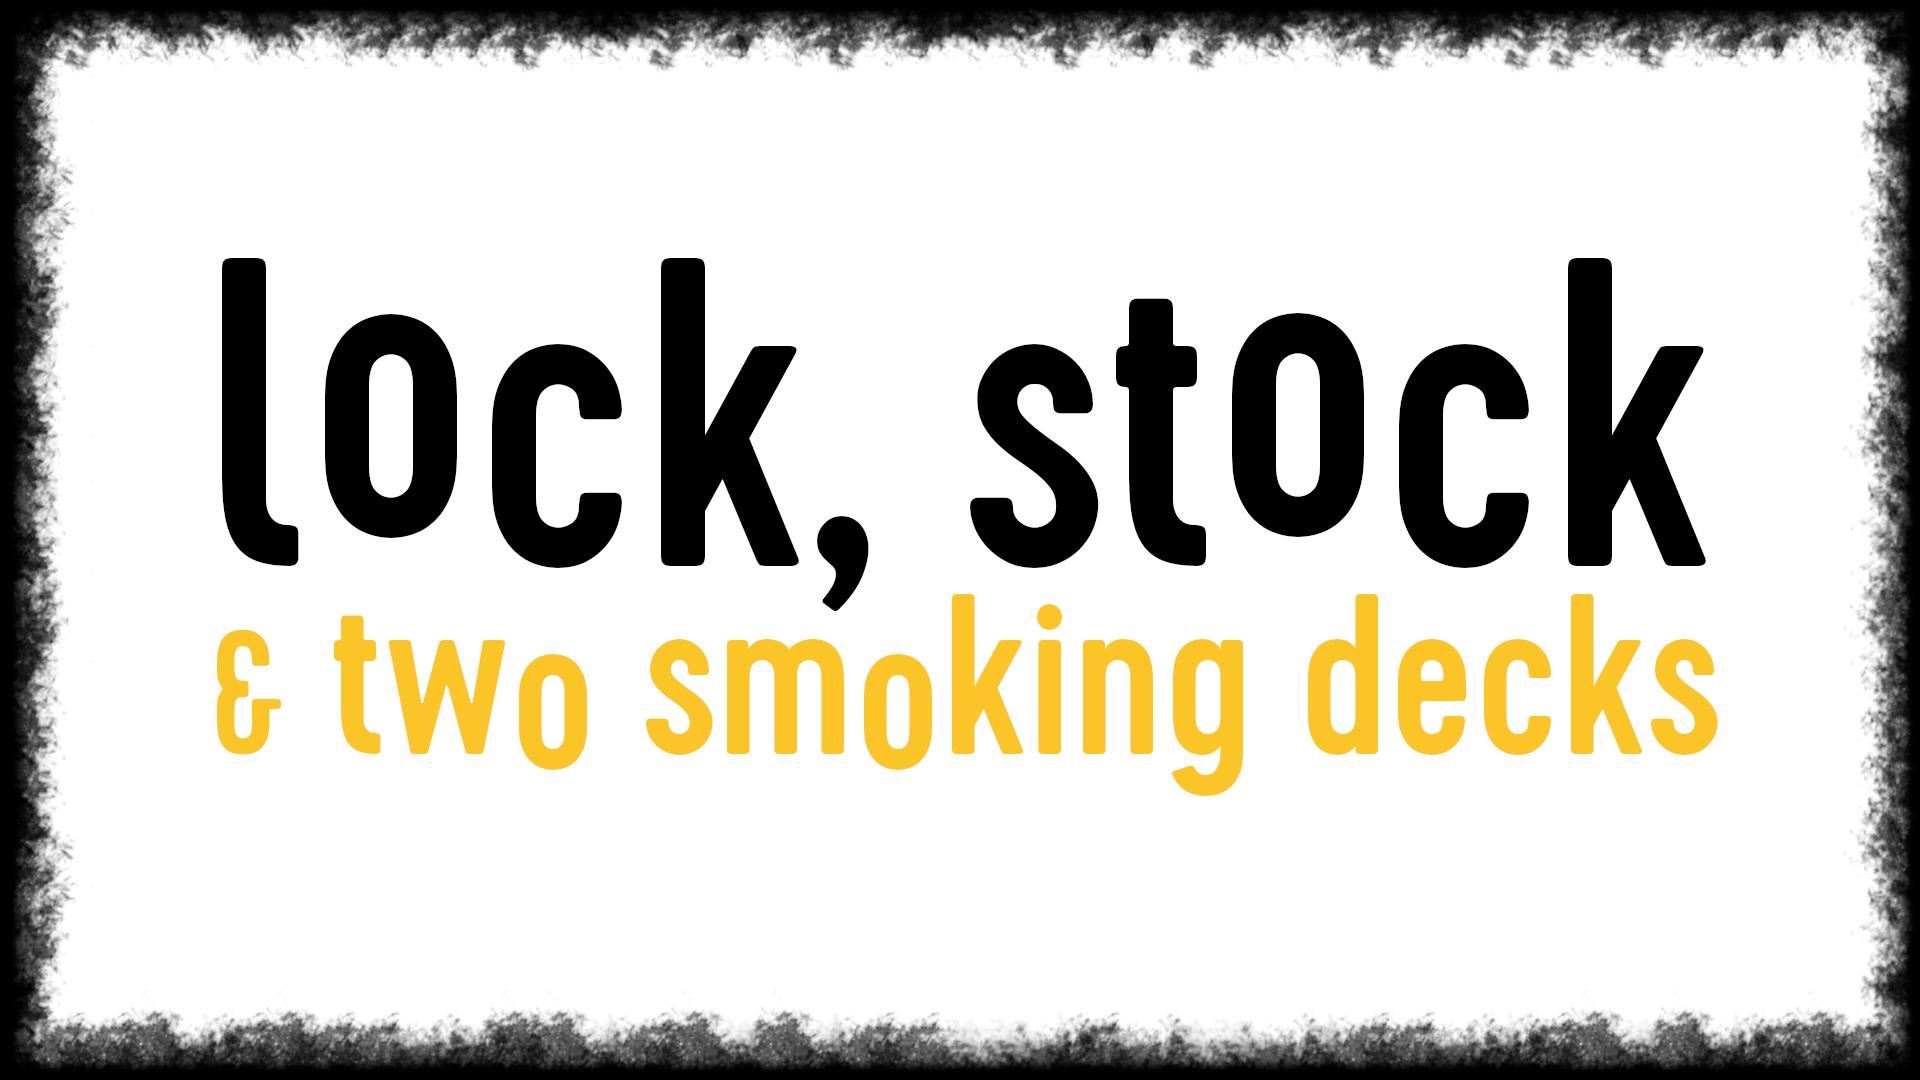 Lock Stock & Two Smoking Decks